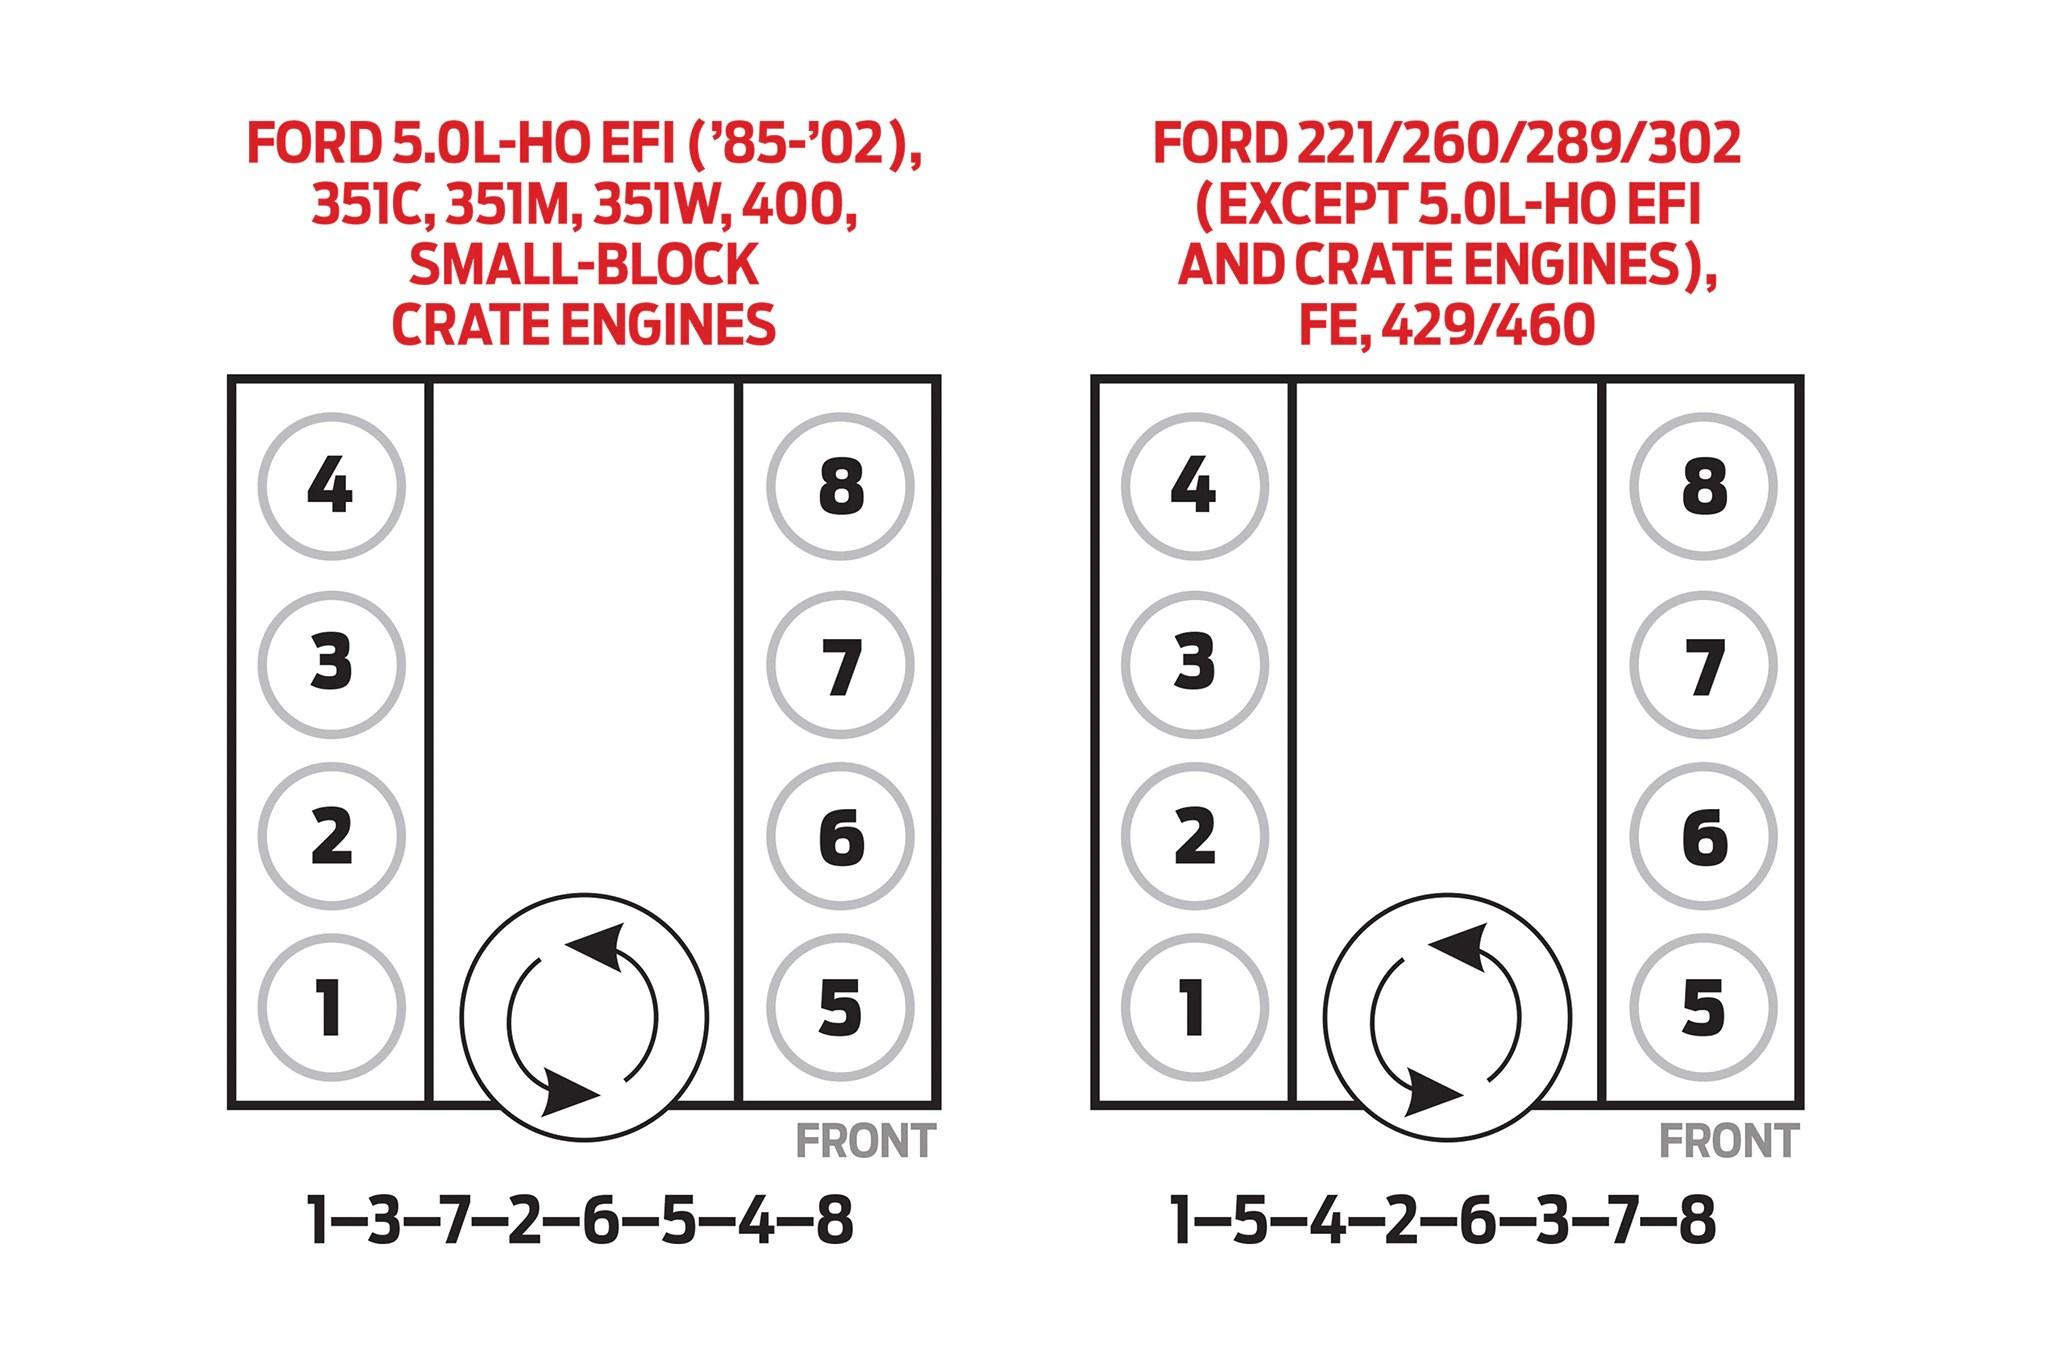 ford 4 0 firing order diagram 1993 ford 5 0 firing order ford ford 4 0 v6 engine firing diagram [ 2048 x 1360 Pixel ]